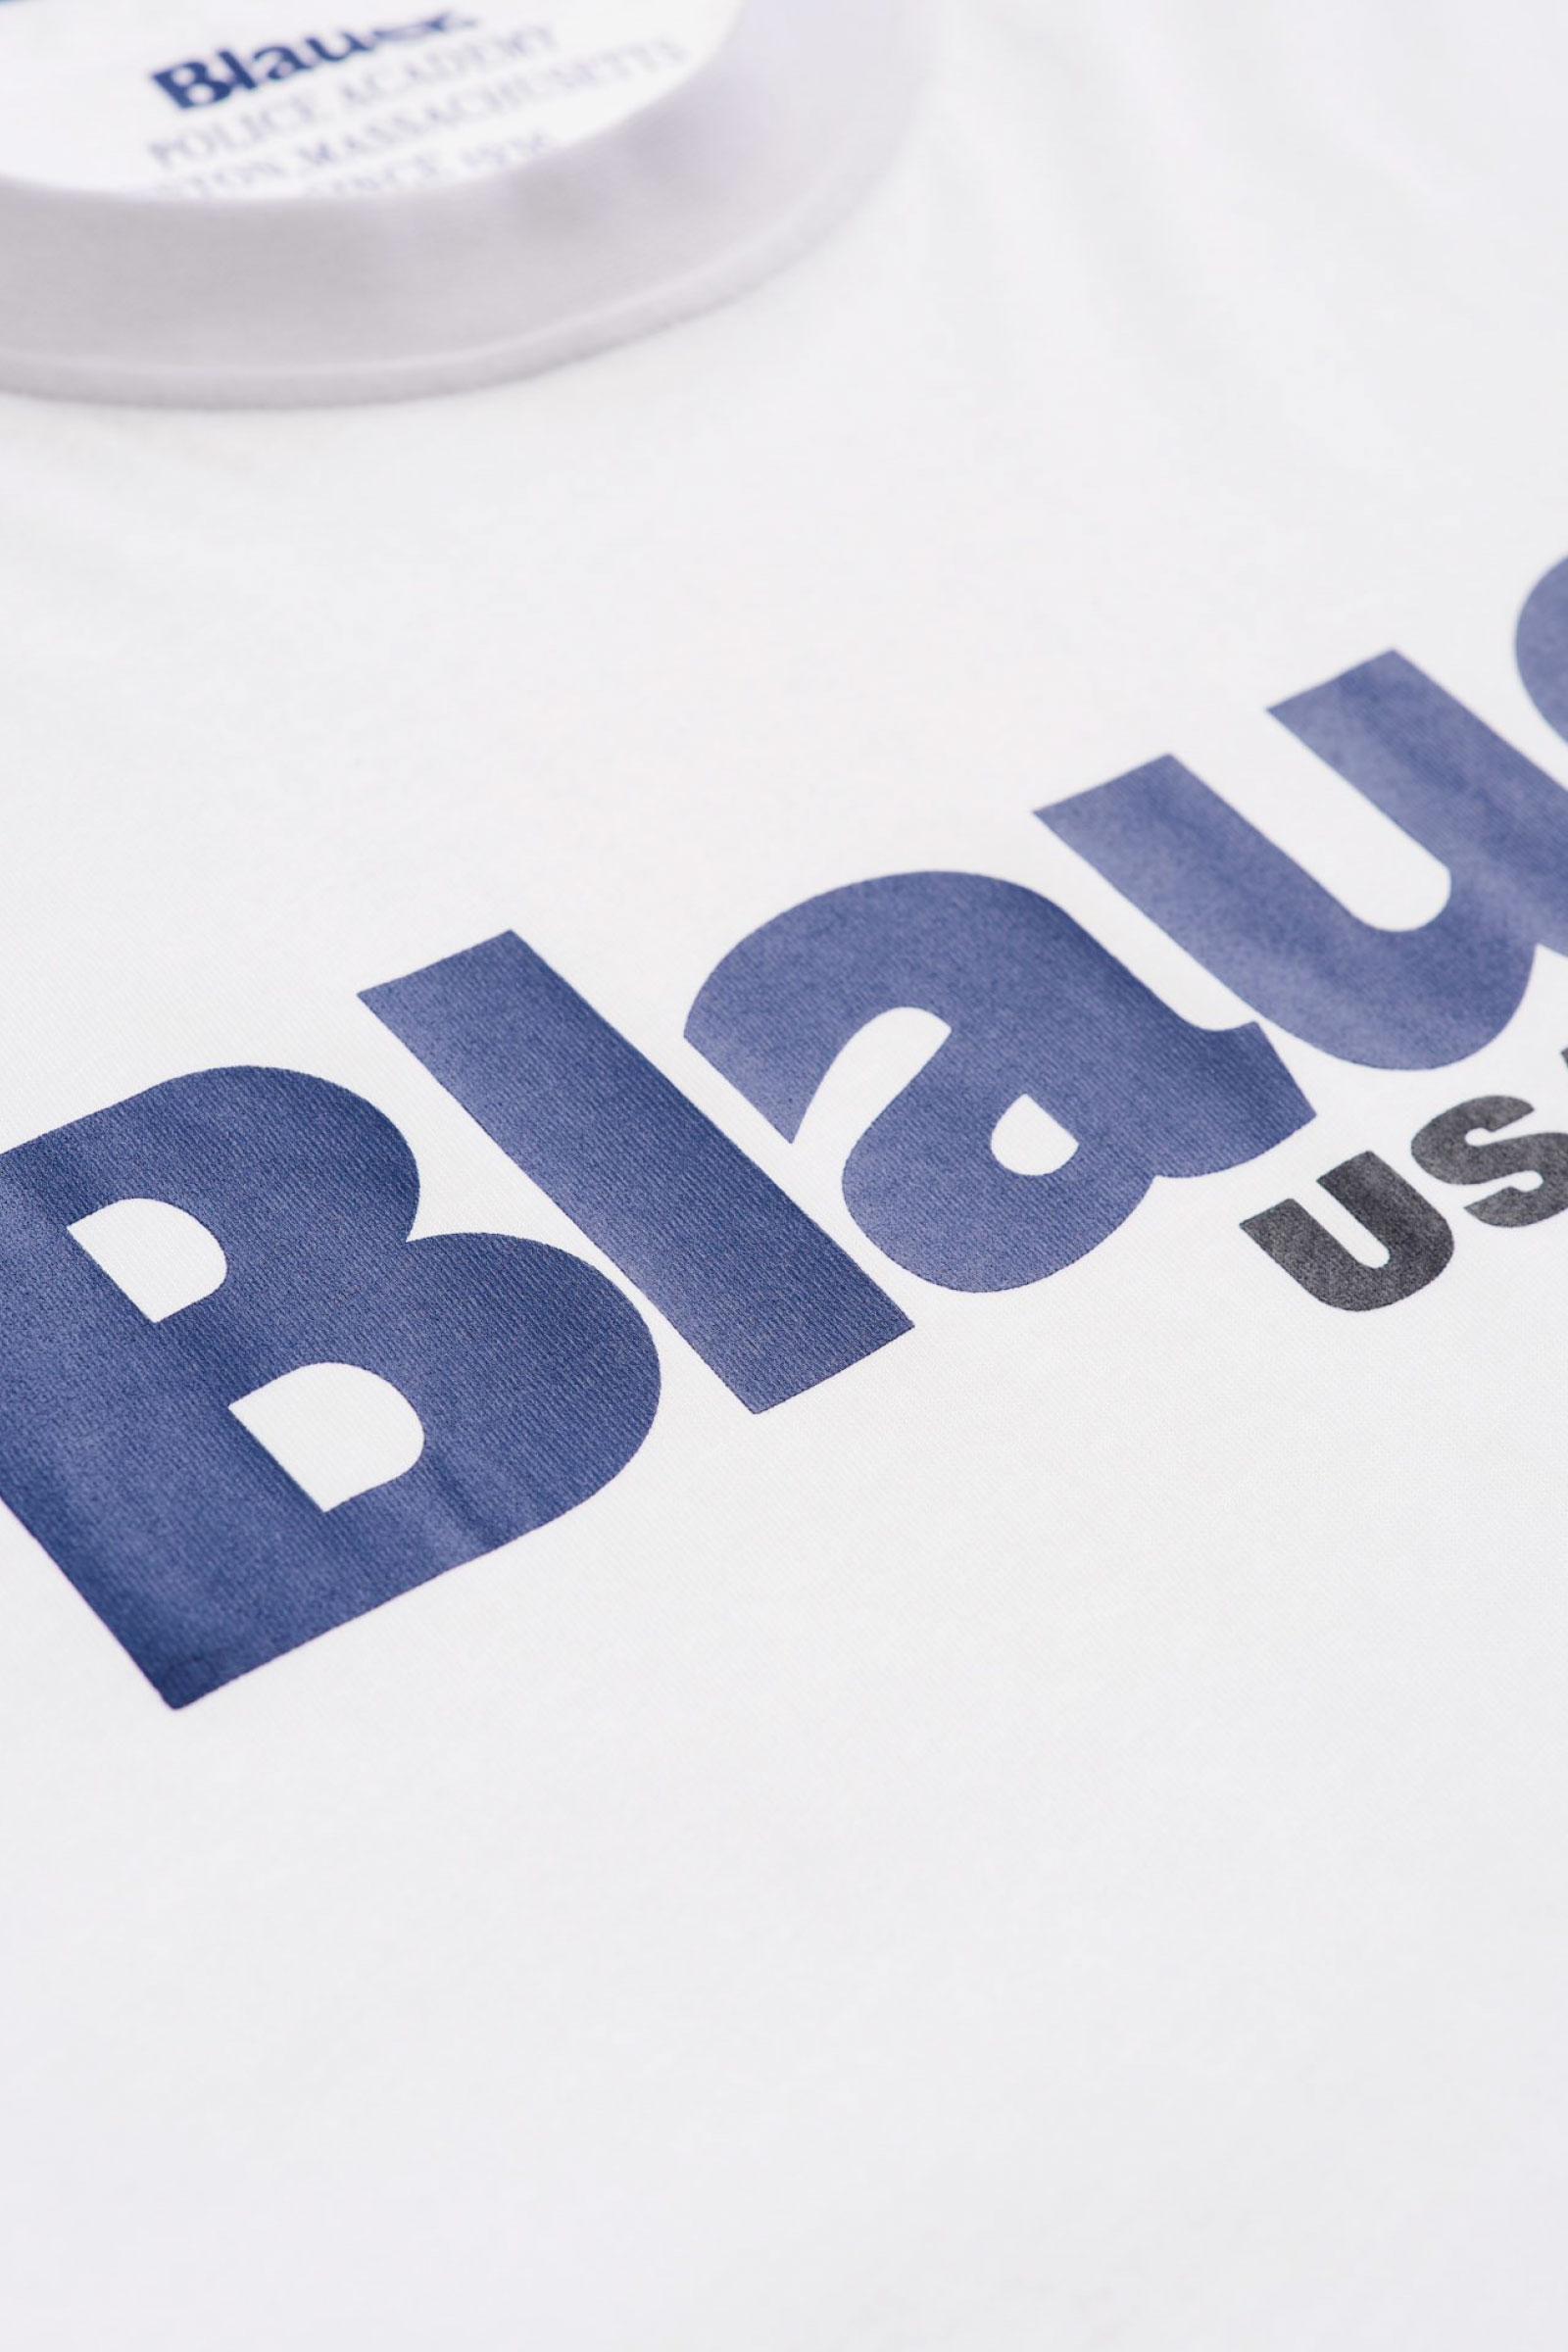 BLAUER Men's T-Shirt BLAUER   T-Shirt   21SBLUH02128100